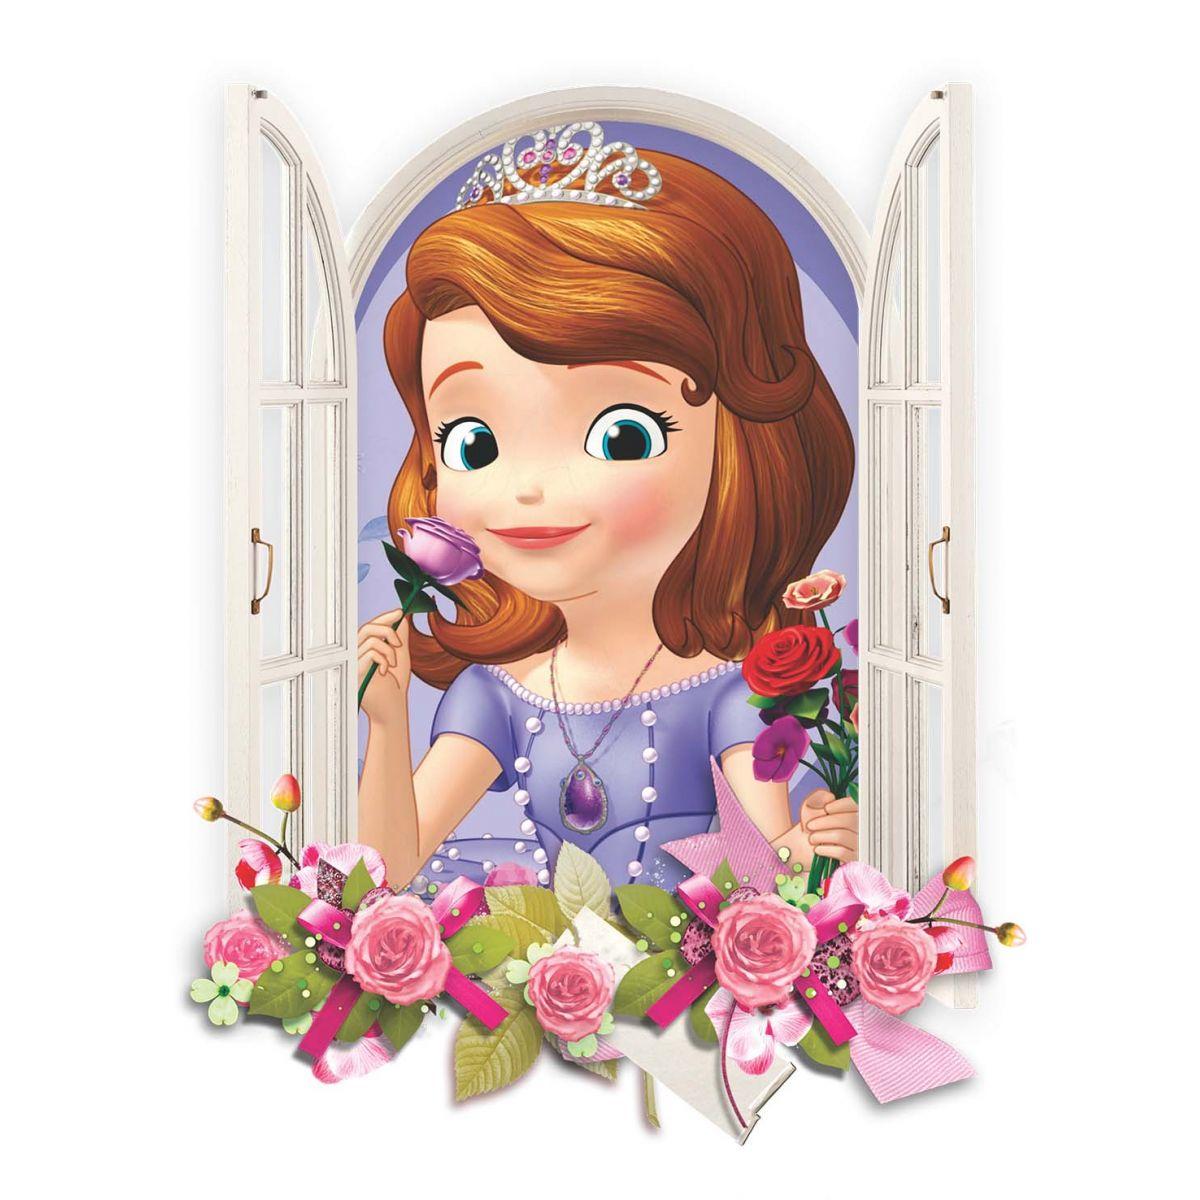 Adesivo Para Moto Frases ~ Adesivo Decorativo de Parede Janela Princesa Sofia SHOP ADESIVOS